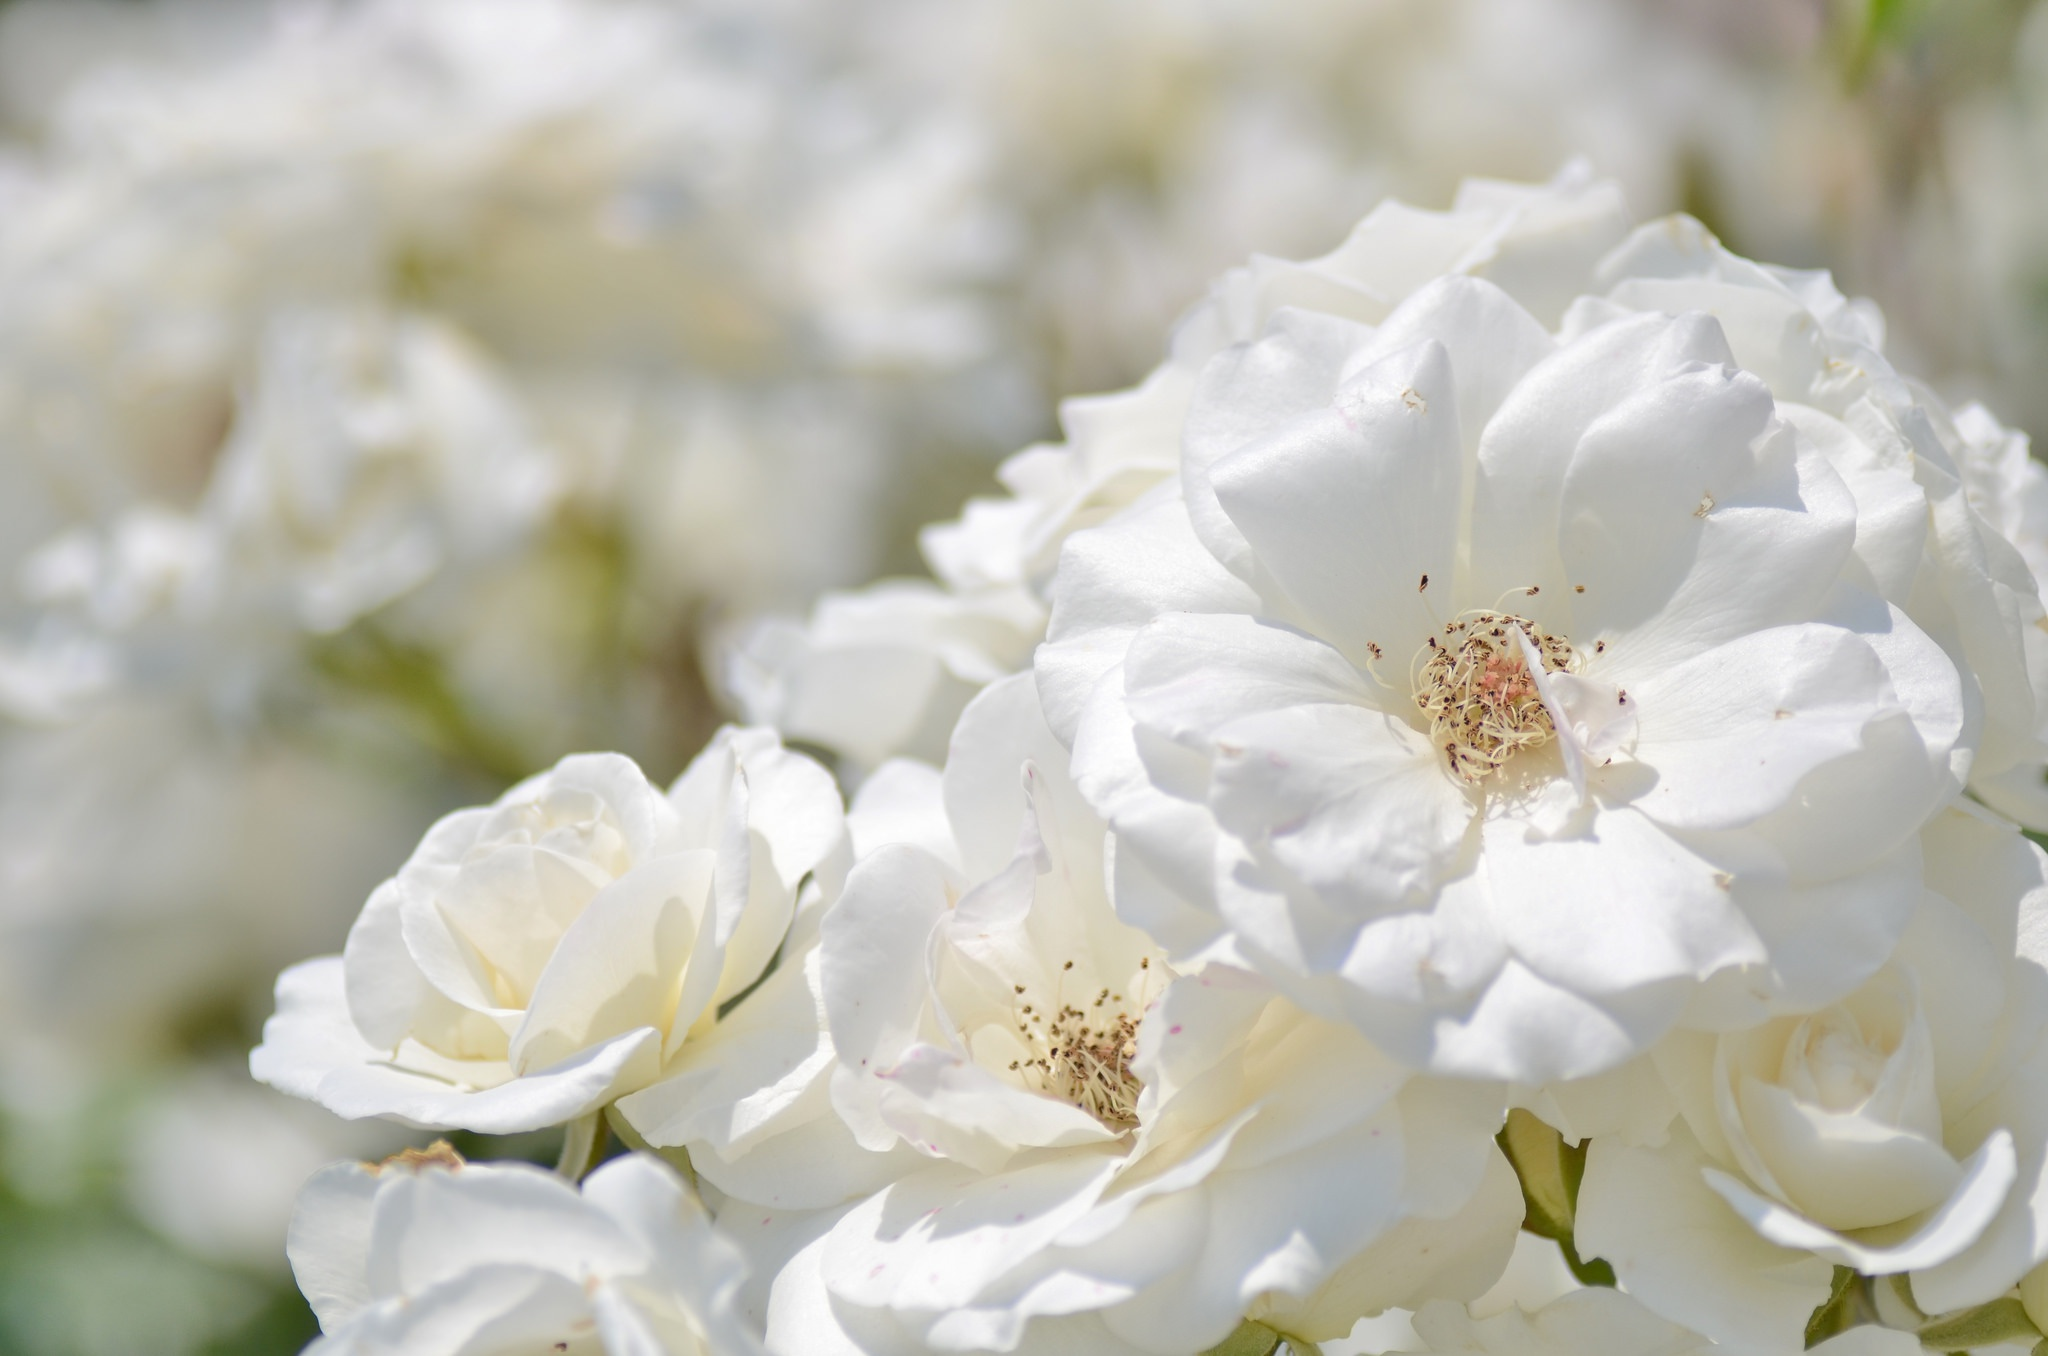 следователи картинки белых роз с лепестками роз они непременно